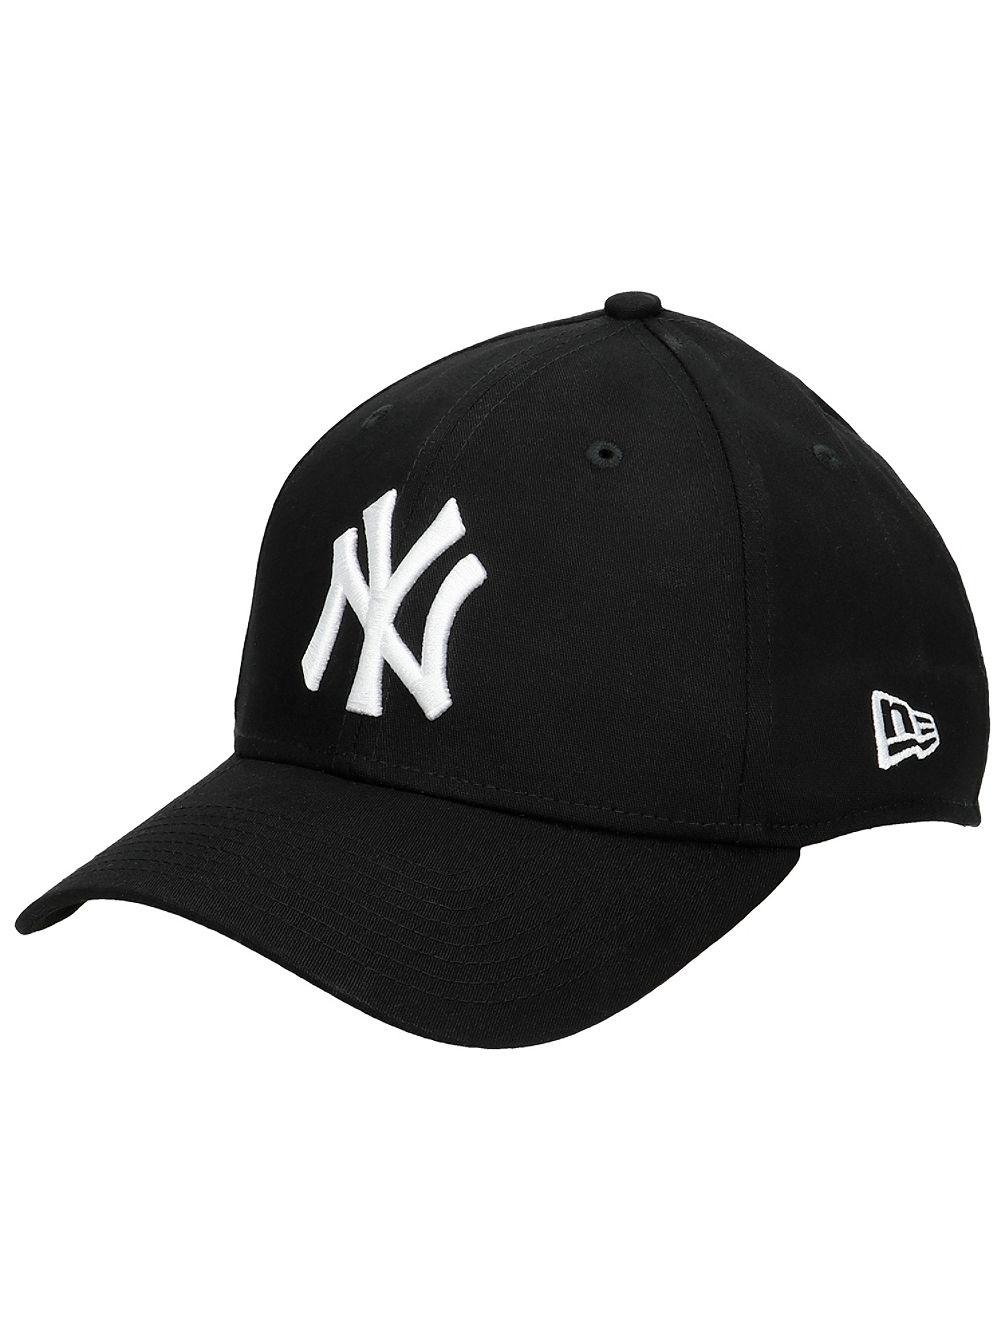 Osta New Era 39THIRTY League Classic NY Yankees Lippis verkosta  blue-tomato.com cdb87e8077